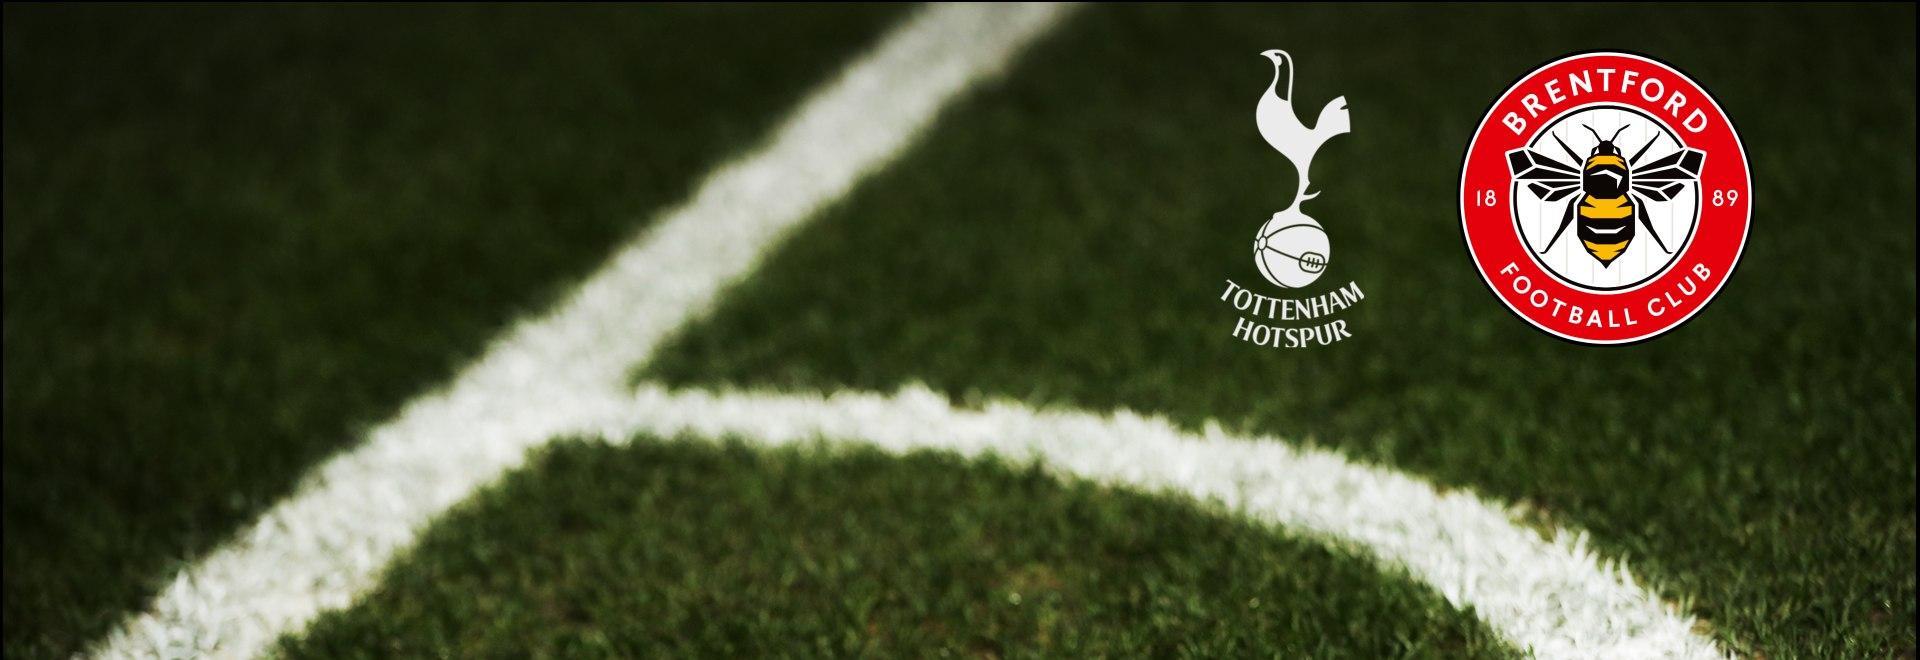 Tottenham - Brentford